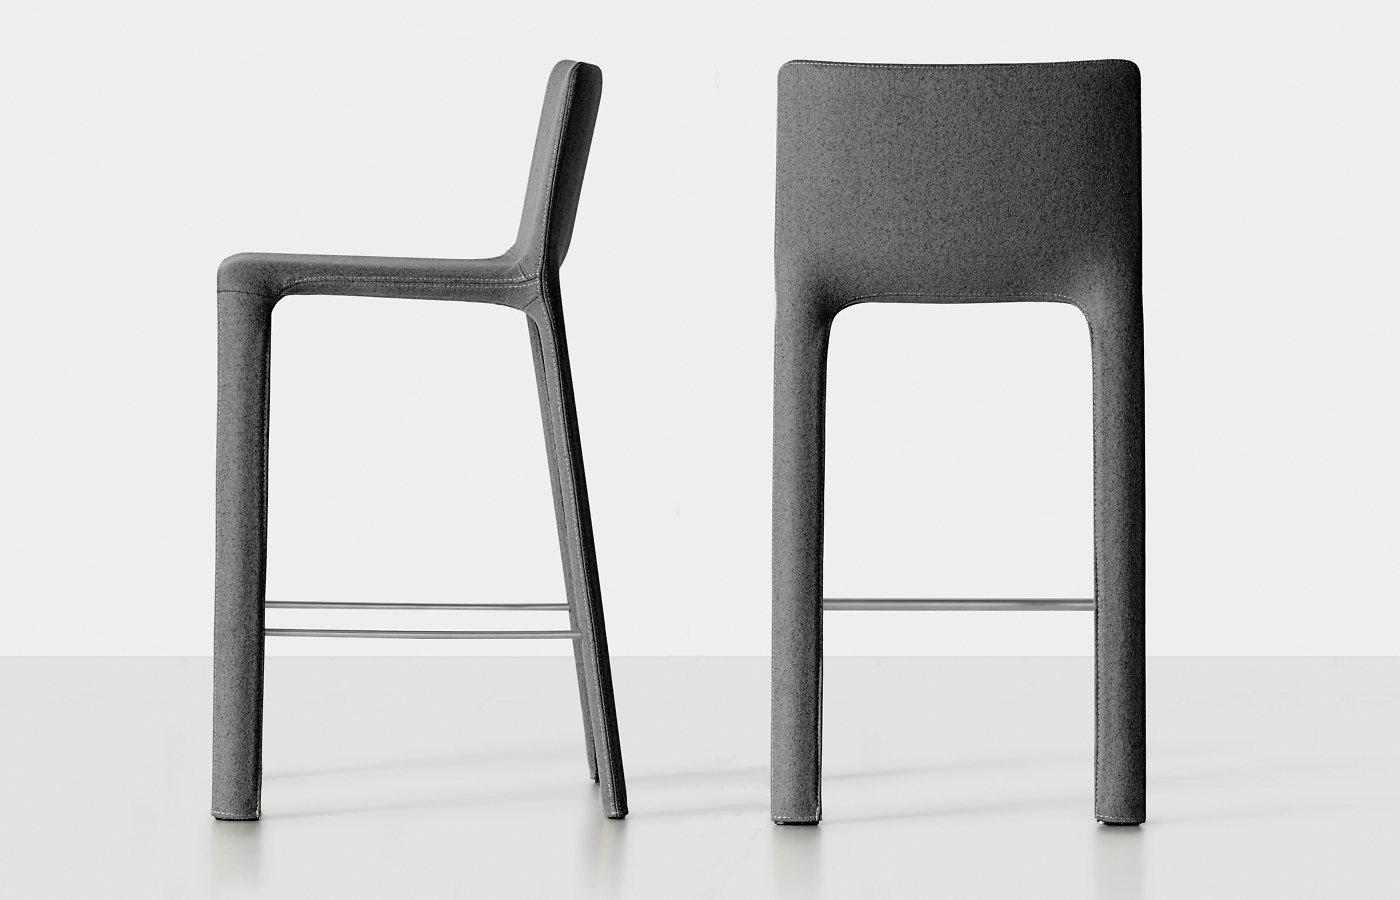 Joko stool from Kristalia, designed by Bartoli Design